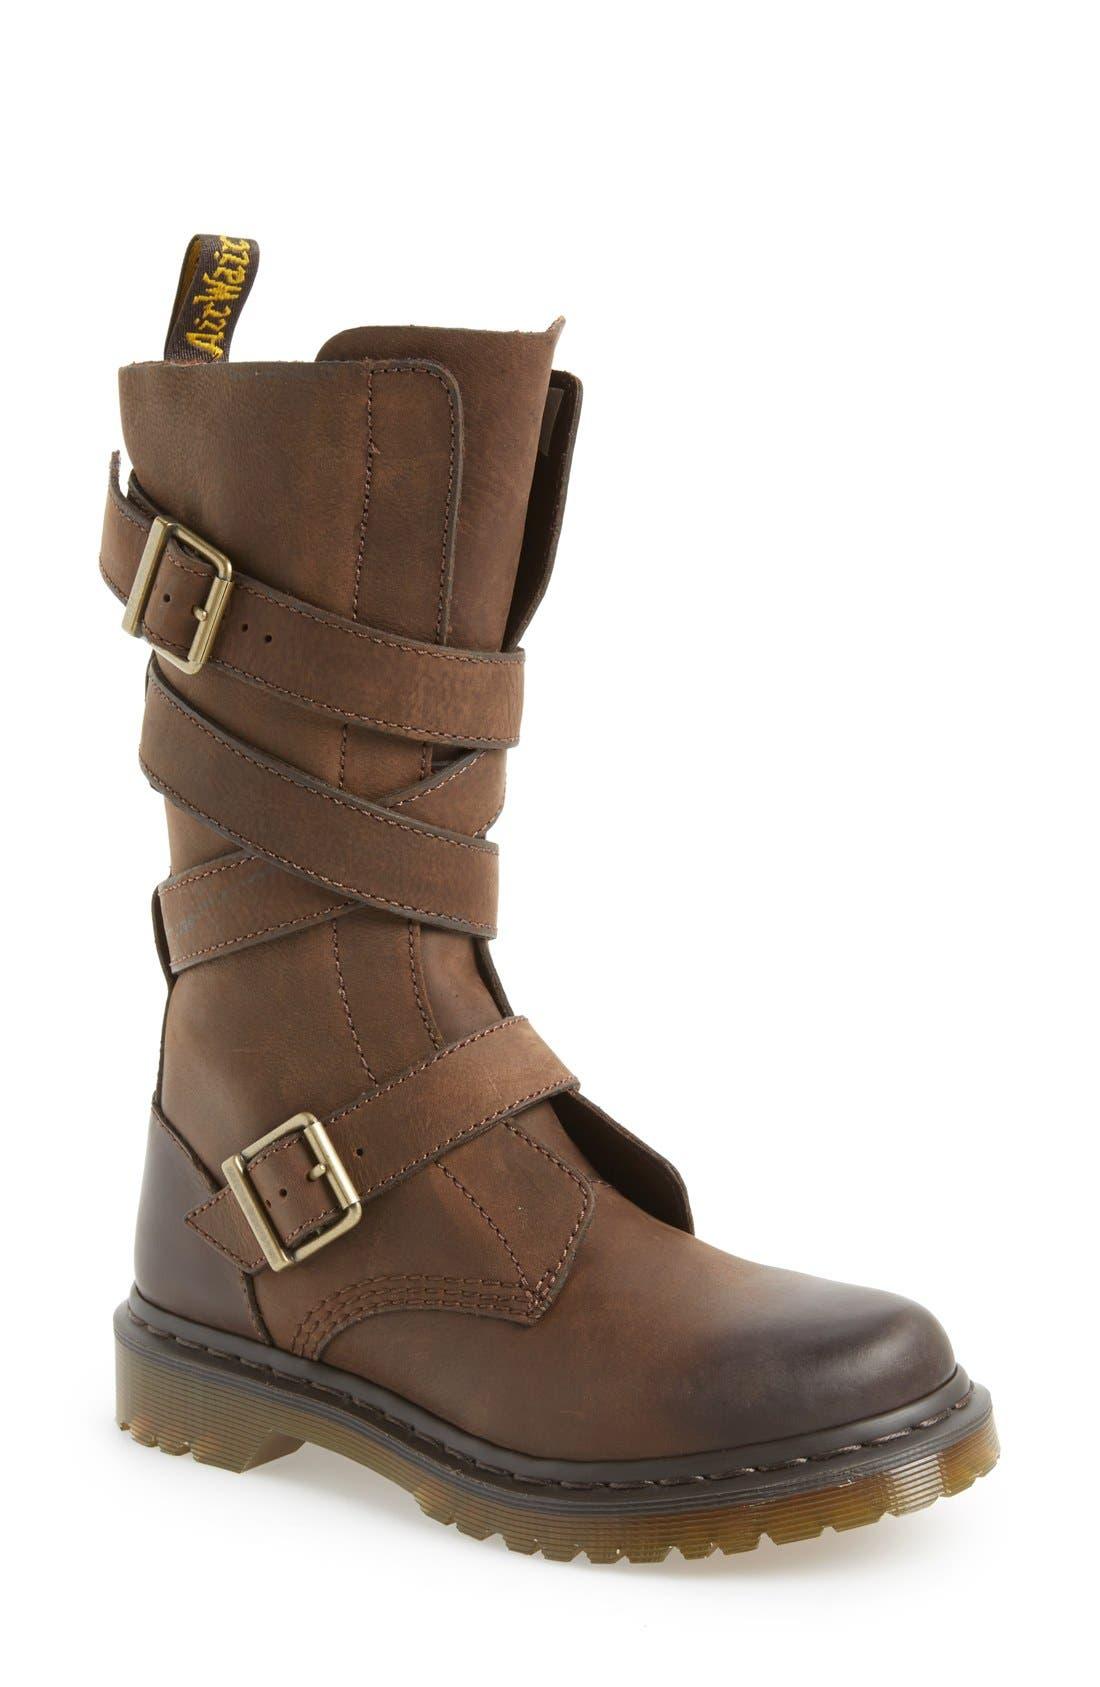 Main Image - Dr. Martens 'Lauren' Lug Military Boot (Women)